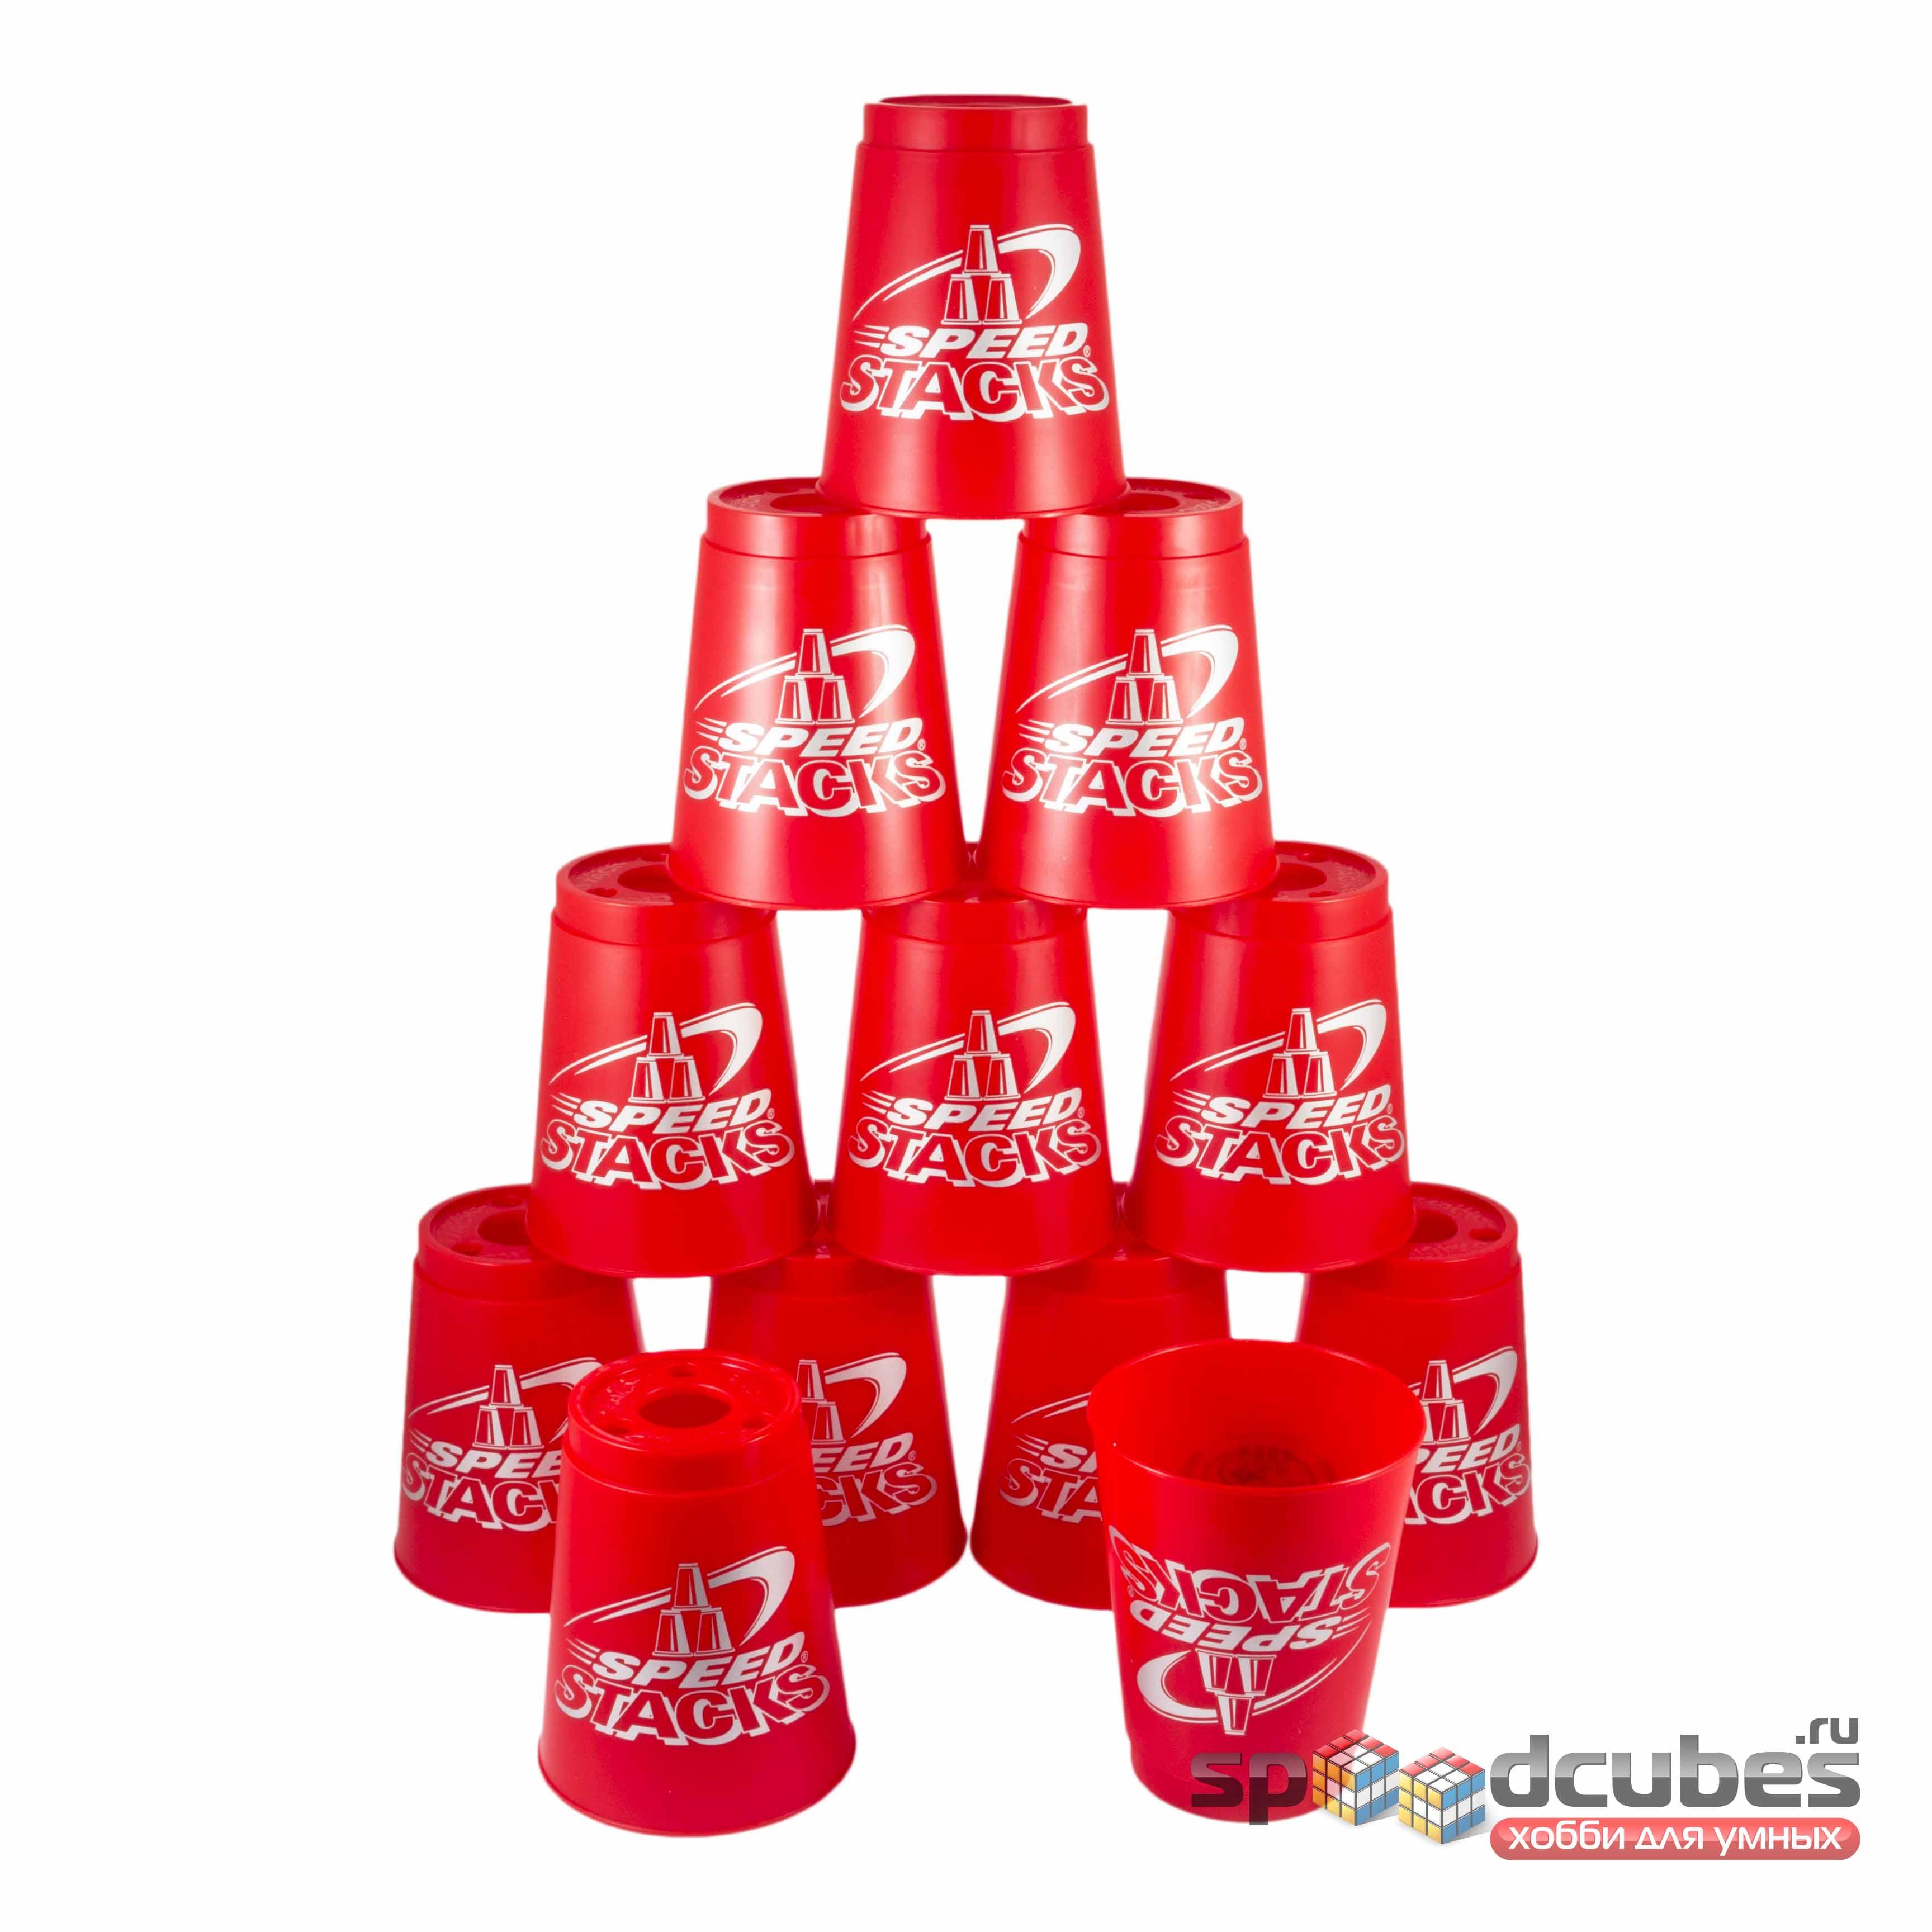 Speed Stacks стаканы для спидстакинга 2